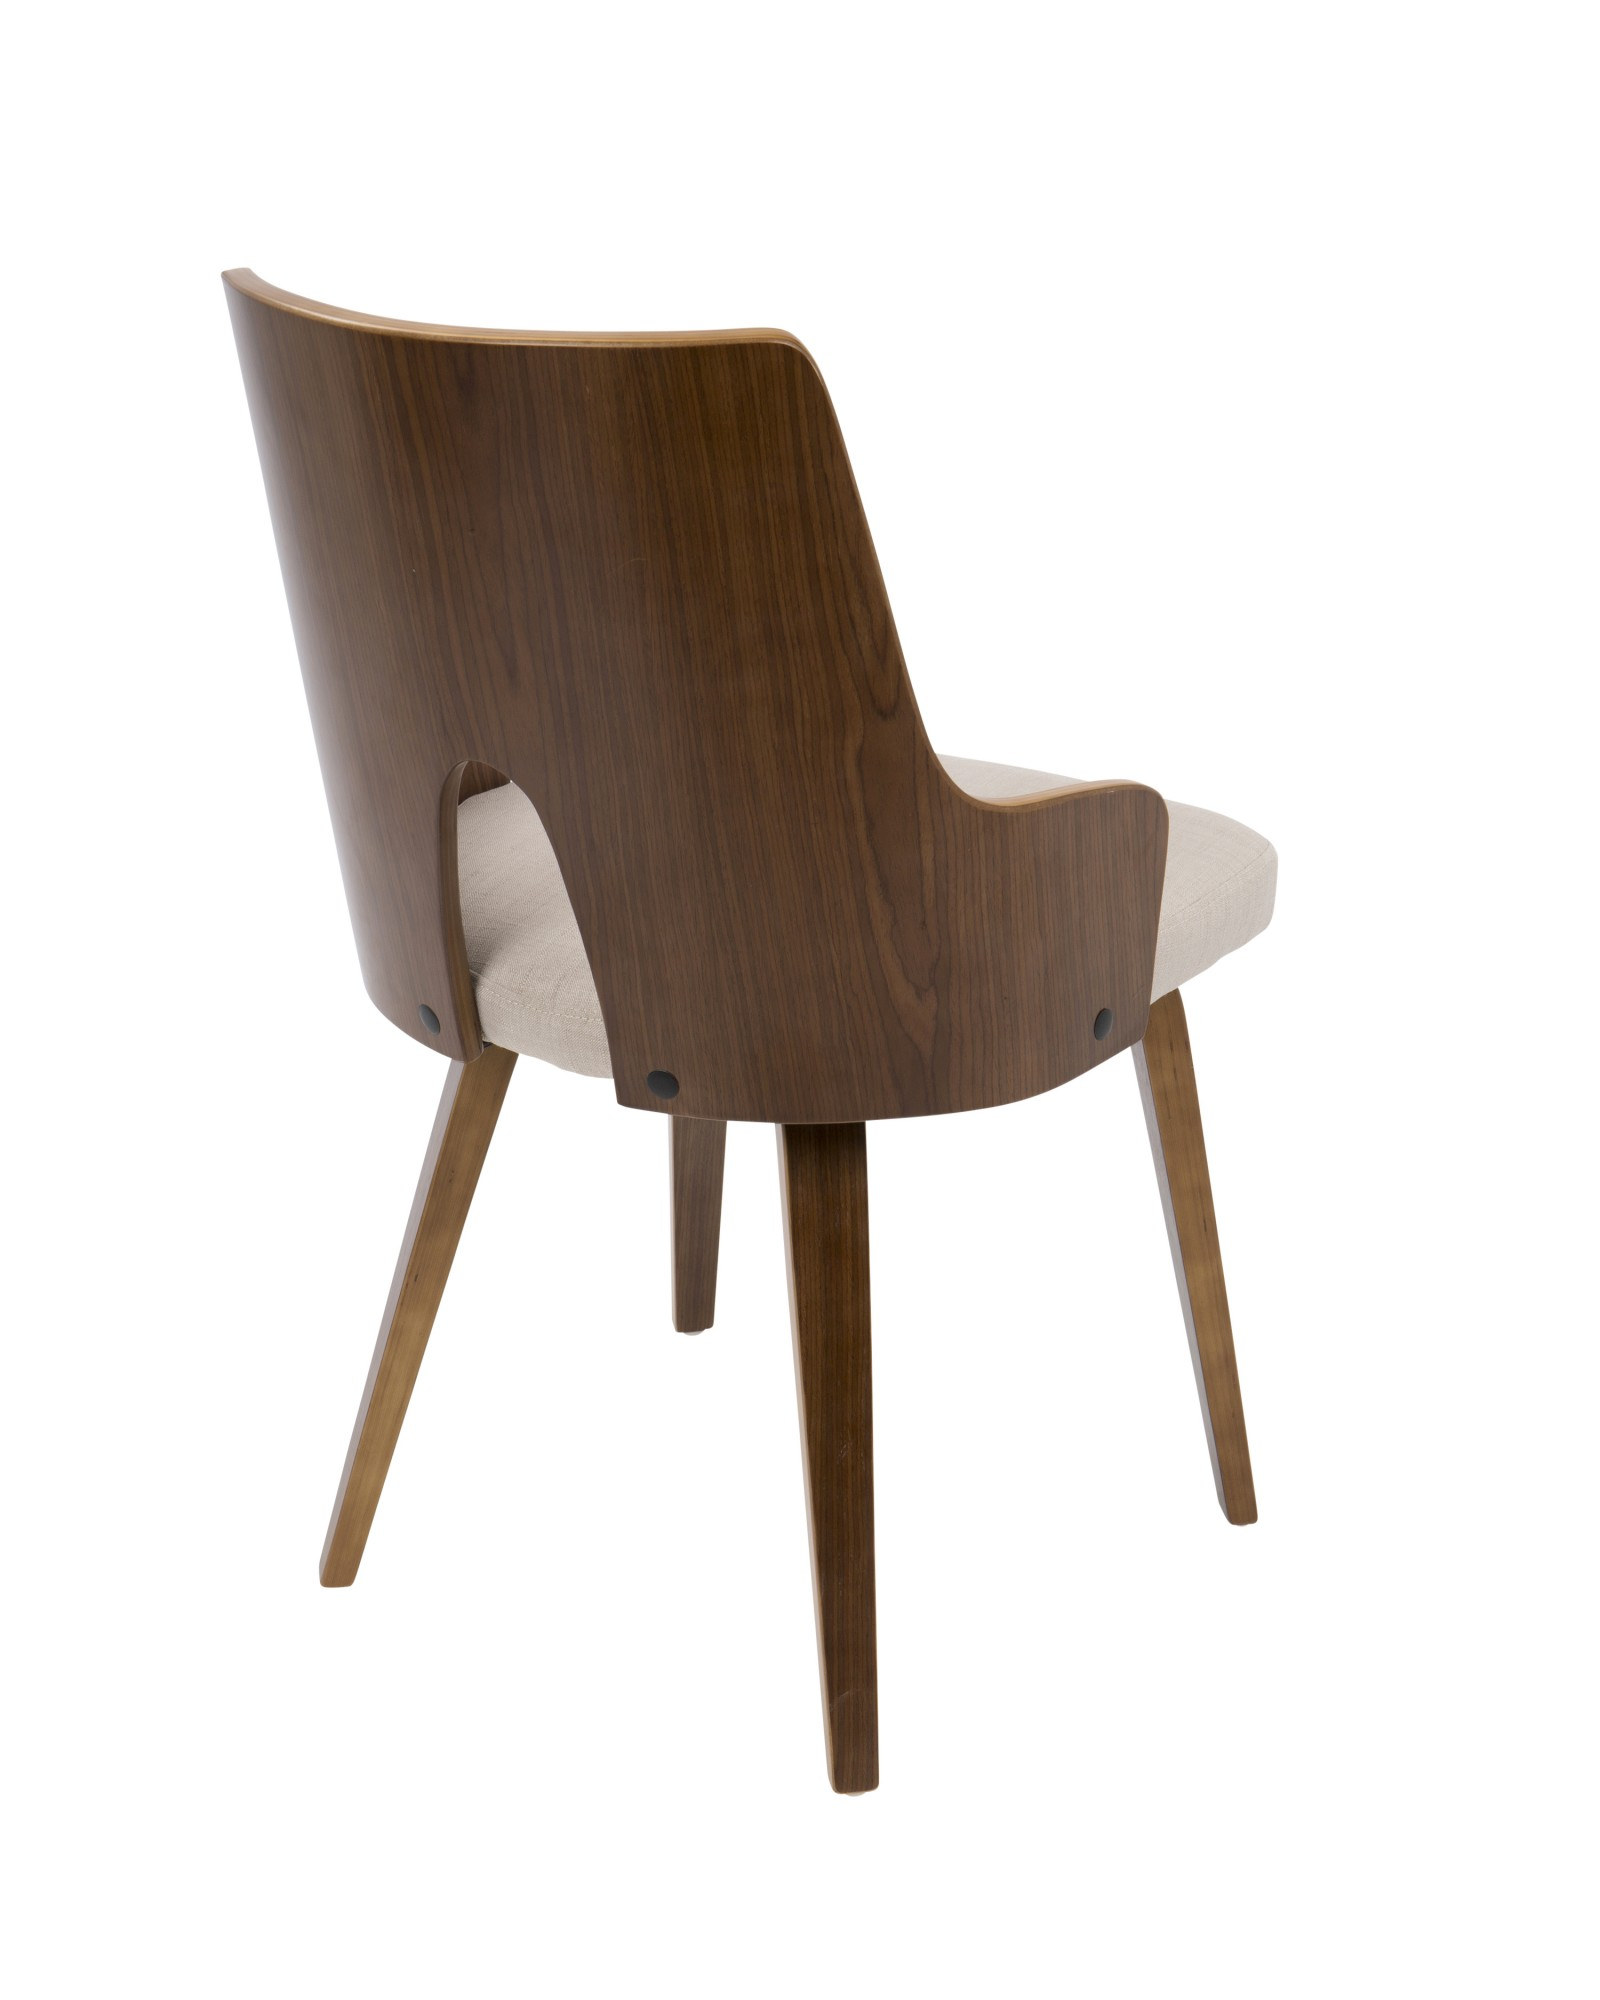 Pleasant Ariana Dining Chair Ariana Mid Century Modern Dining Cjindustries Chair Design For Home Cjindustriesco